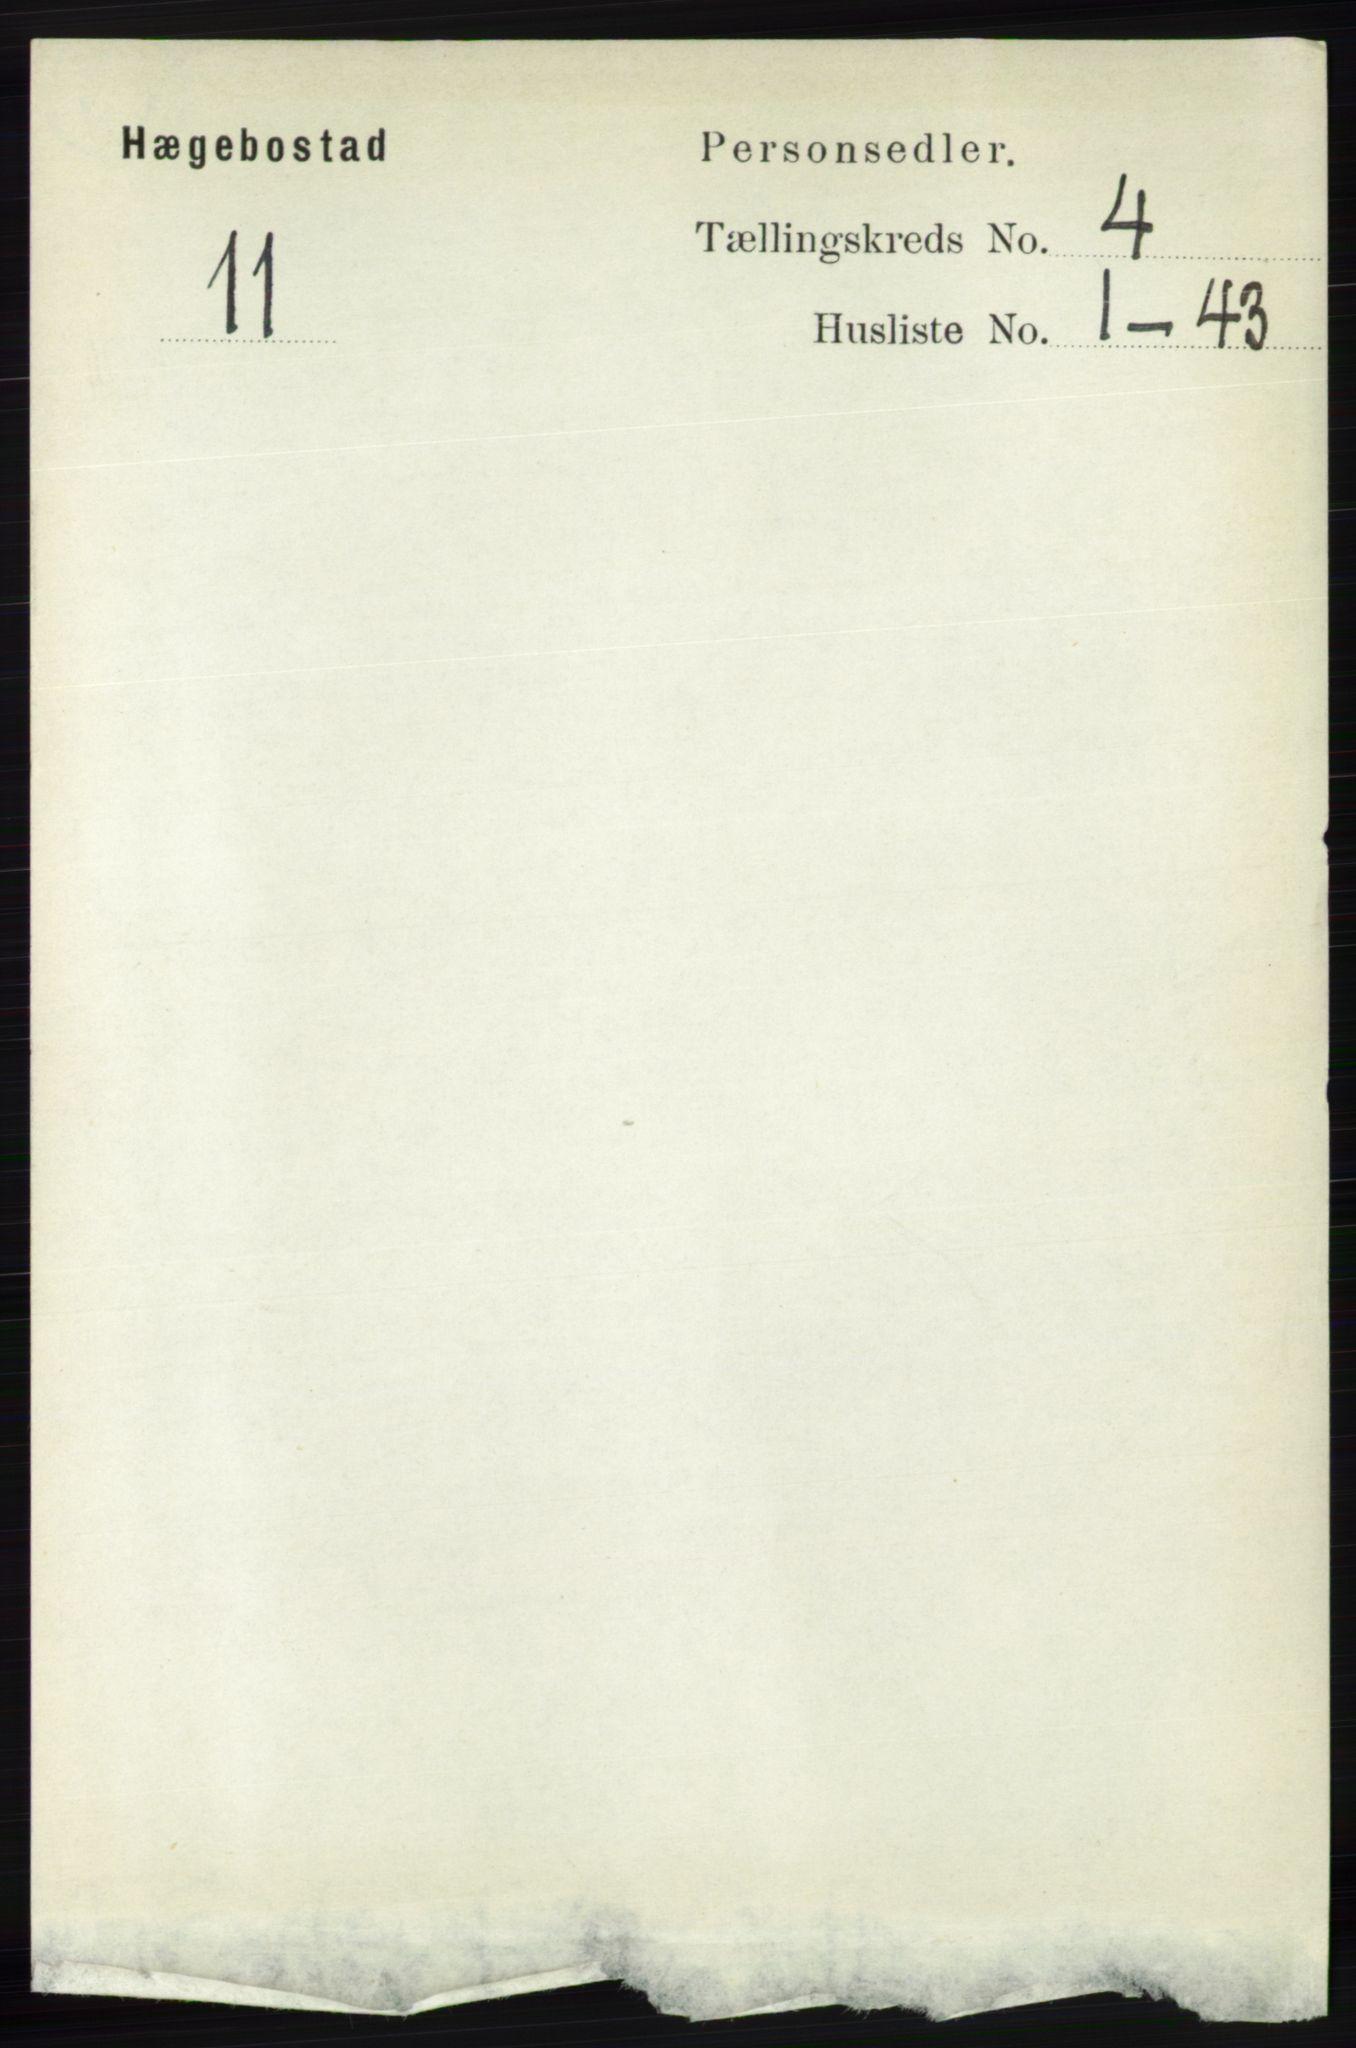 RA, Folketelling 1891 for 1034 Hægebostad herred, 1891, s. 1189